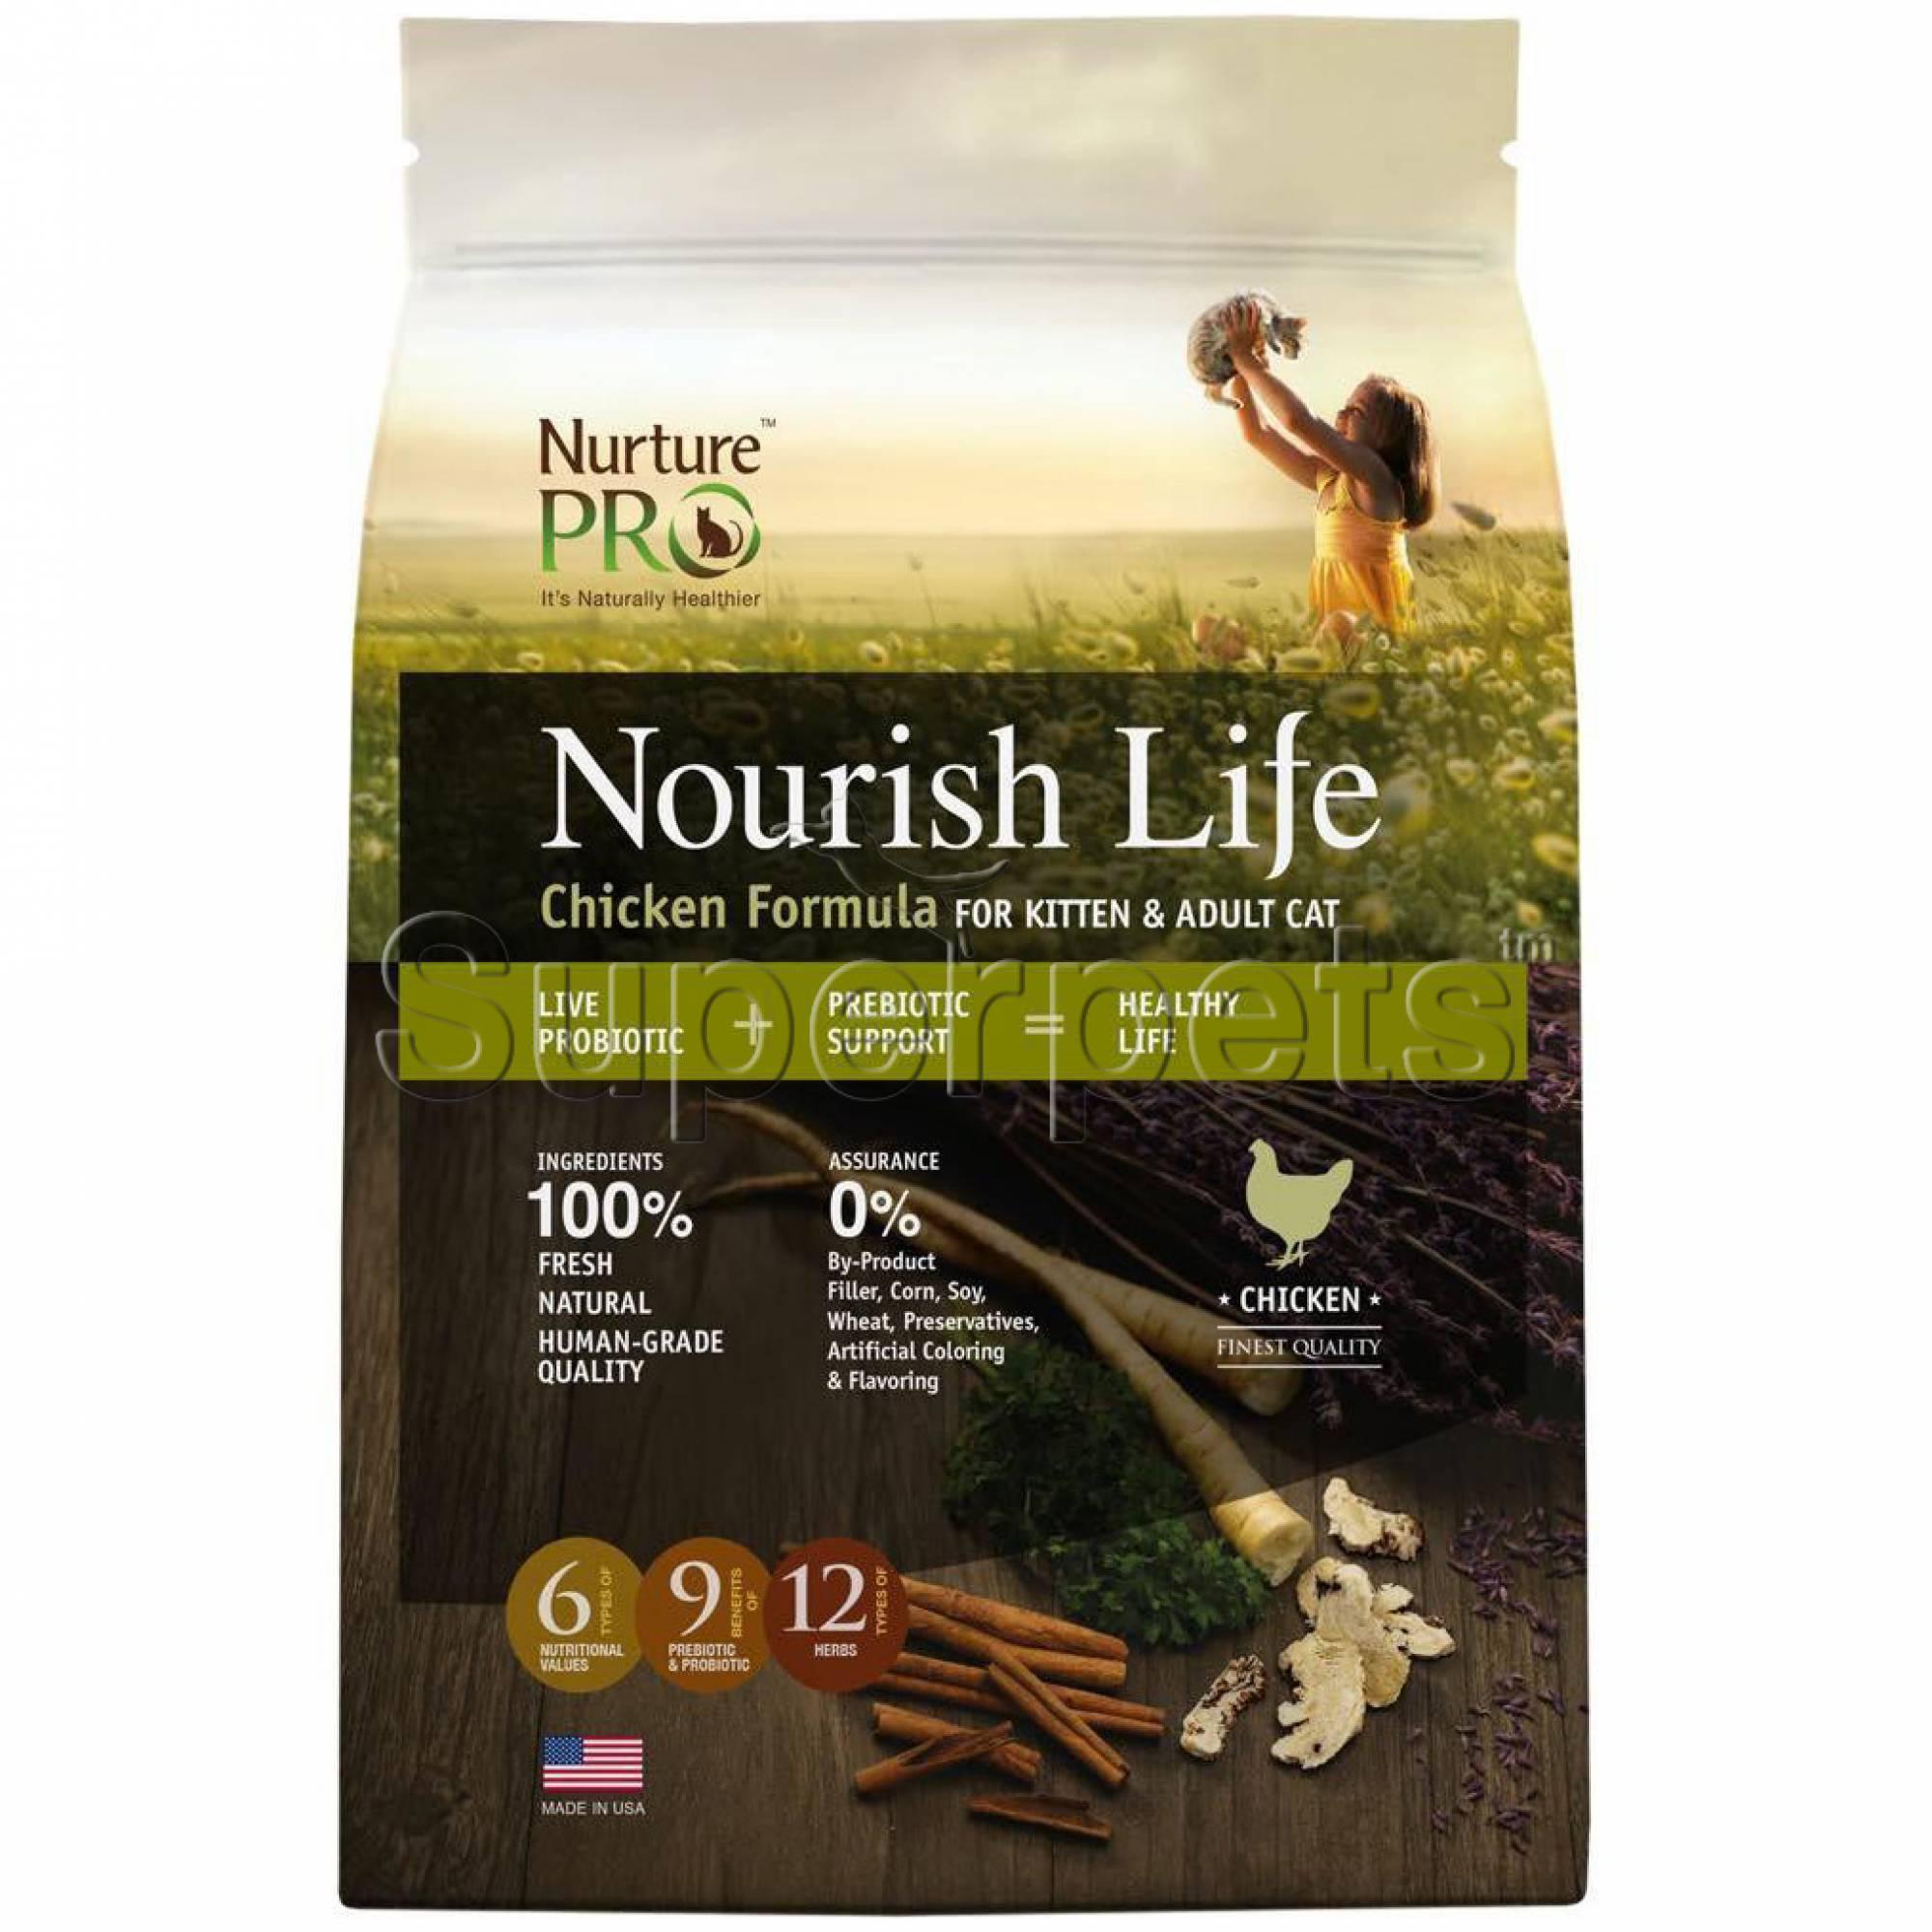 Nurture Pro - Nourish Life - Chicken Formula for Cat & Kitten 40lb (18.14kg)